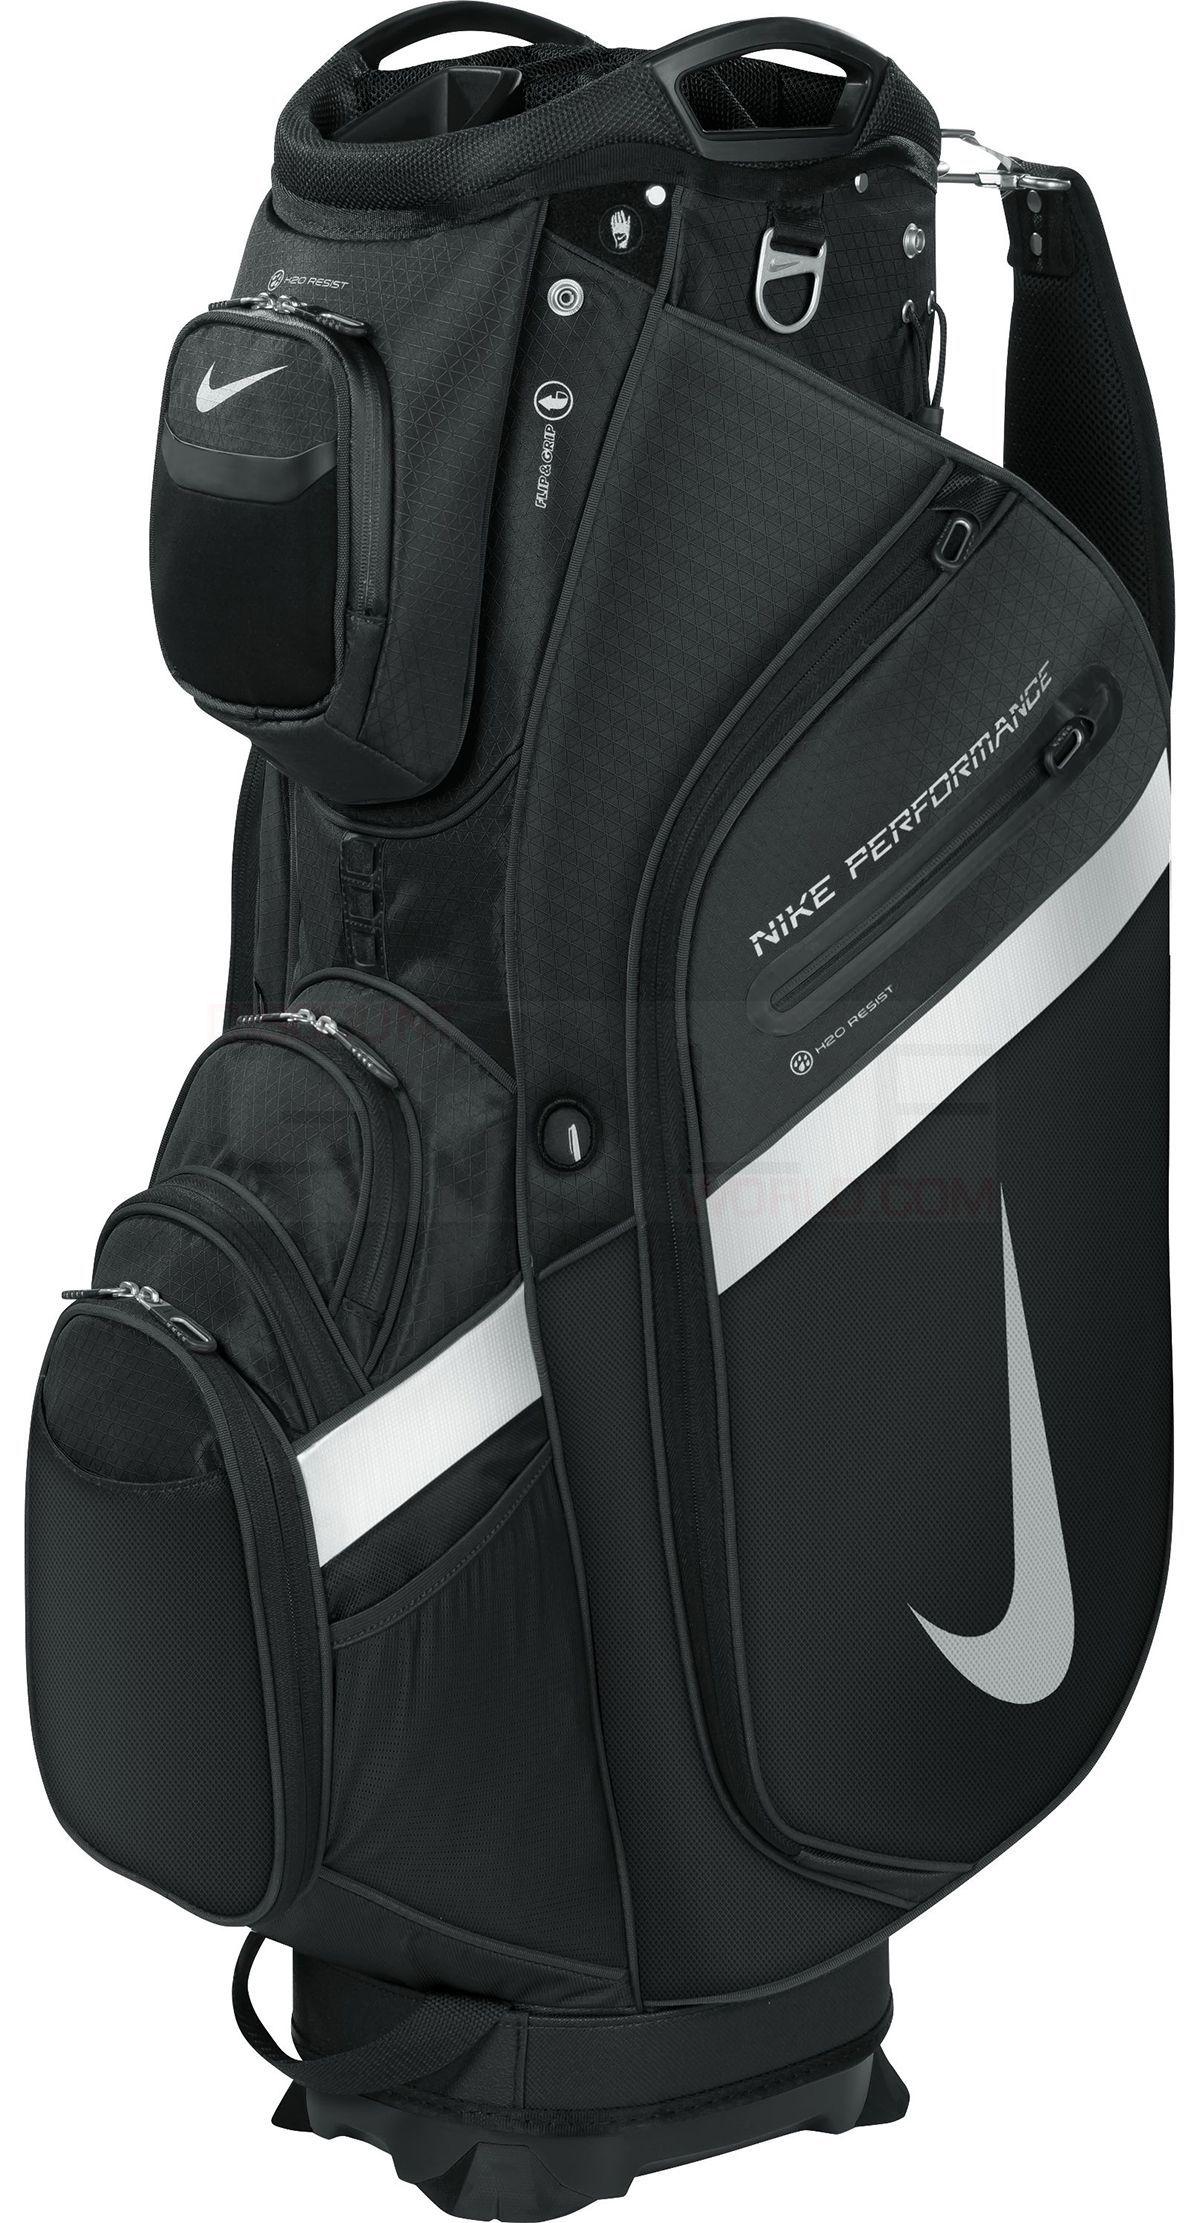 f10d4bc61b Nike Performance Cart IV Bag 14-Way Dual-Sided Top, 19 Functional Pockets  Mens Golf Bags Bags & Carts